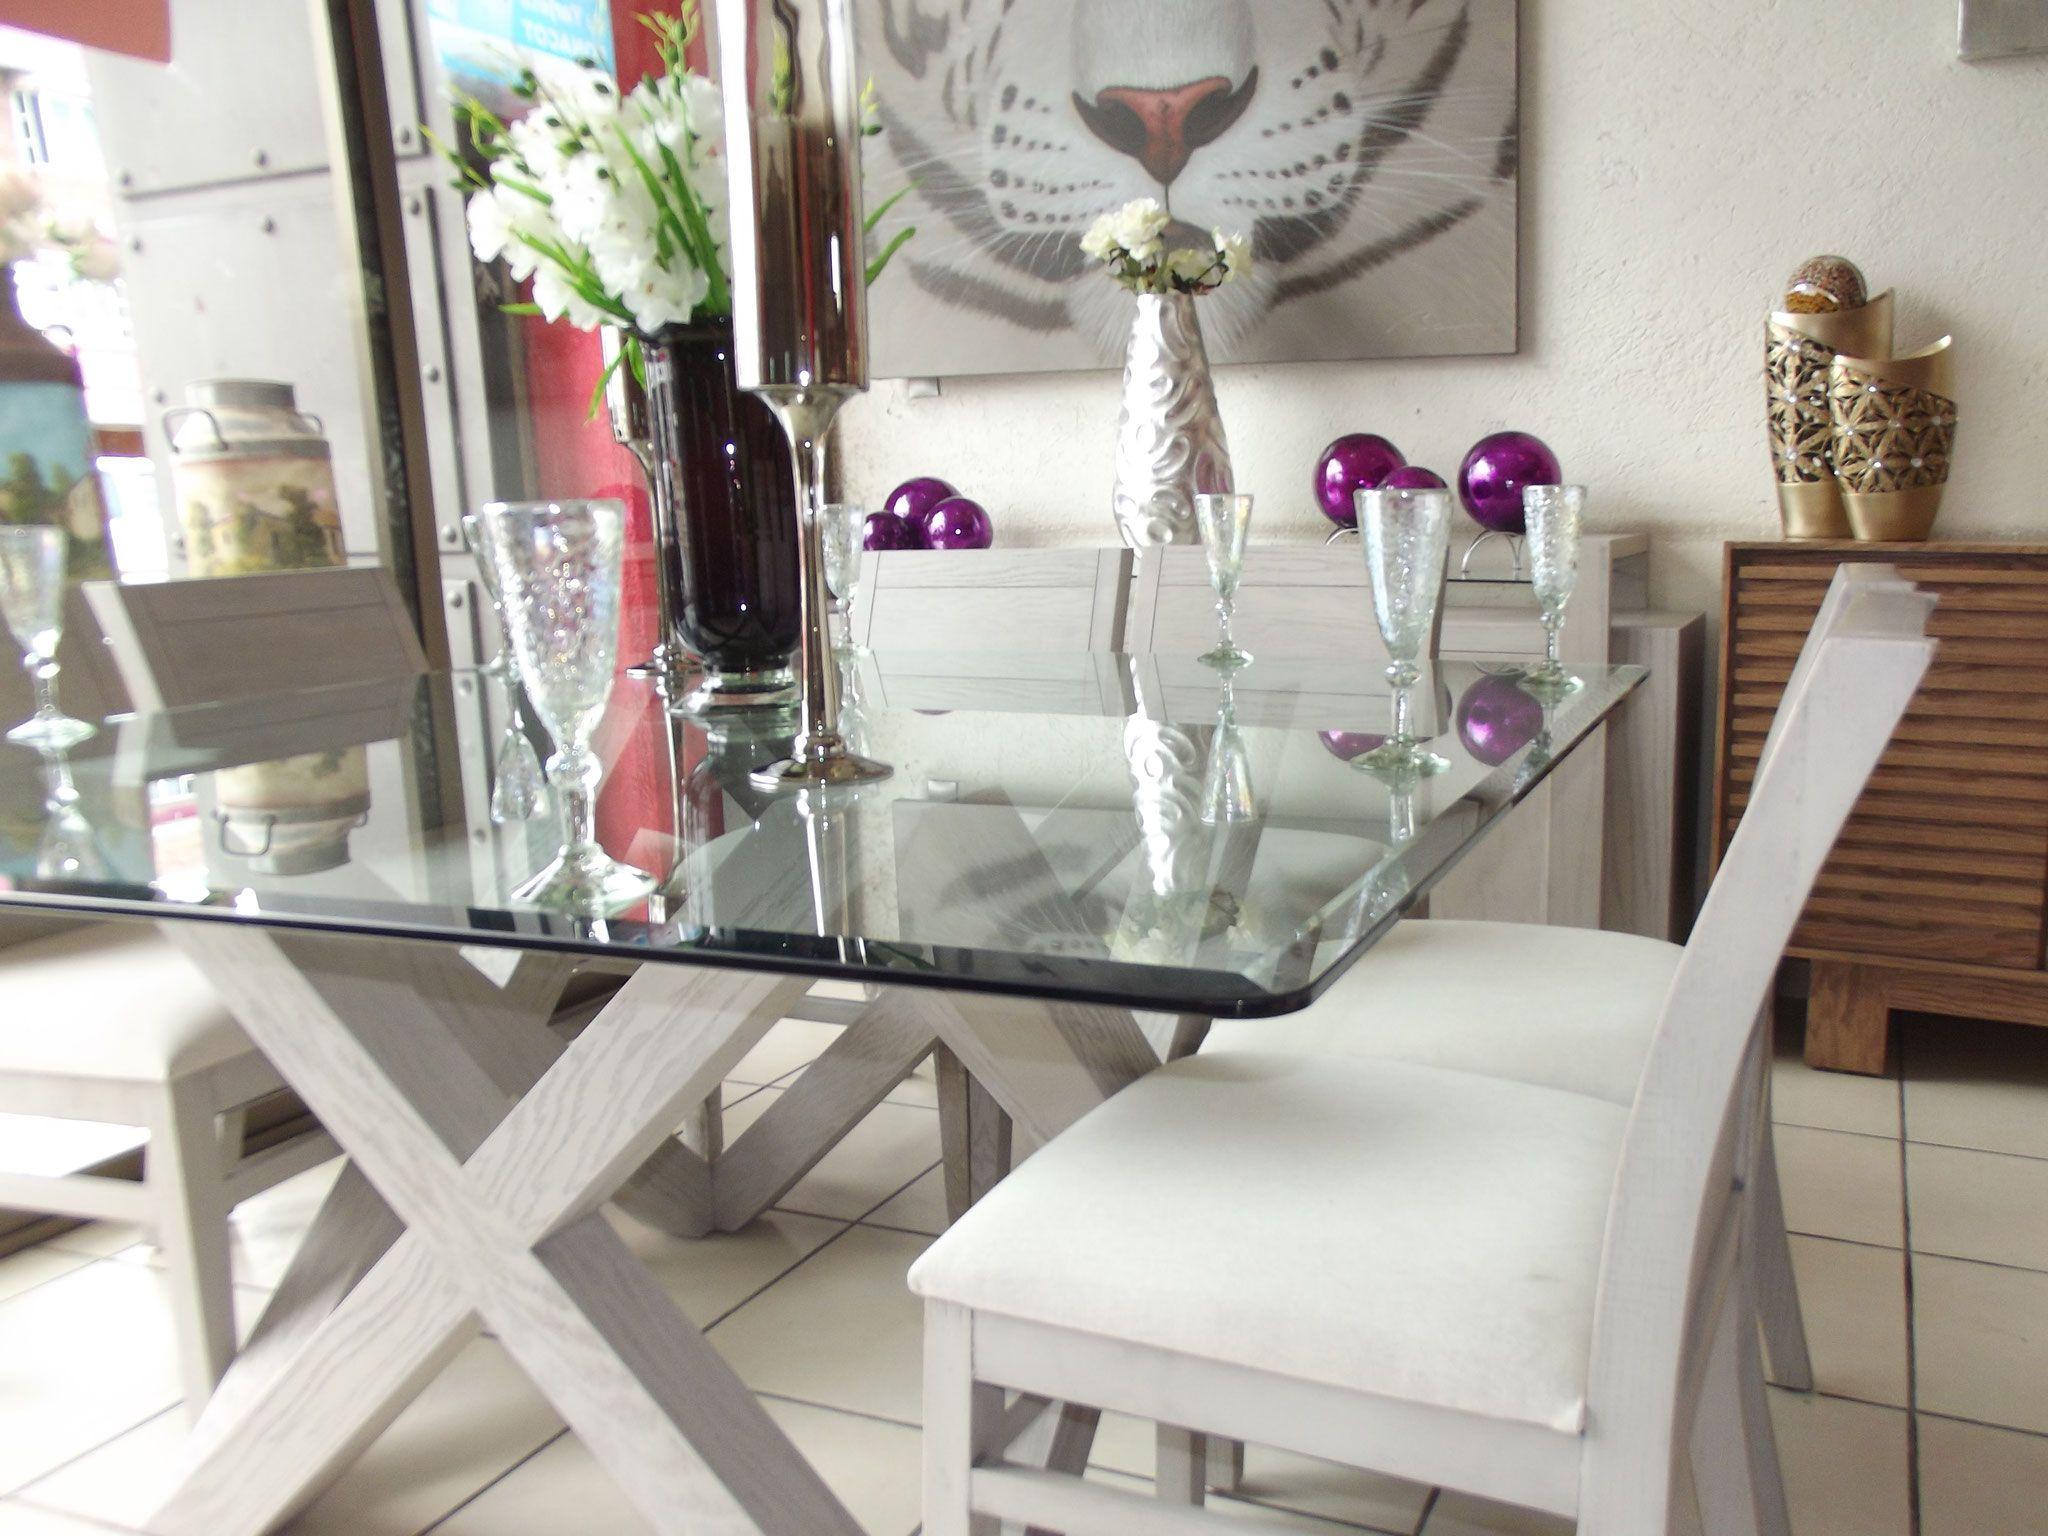 Fabricantes de muebles sanpedro tultepec muebles for Muebles fabricantes